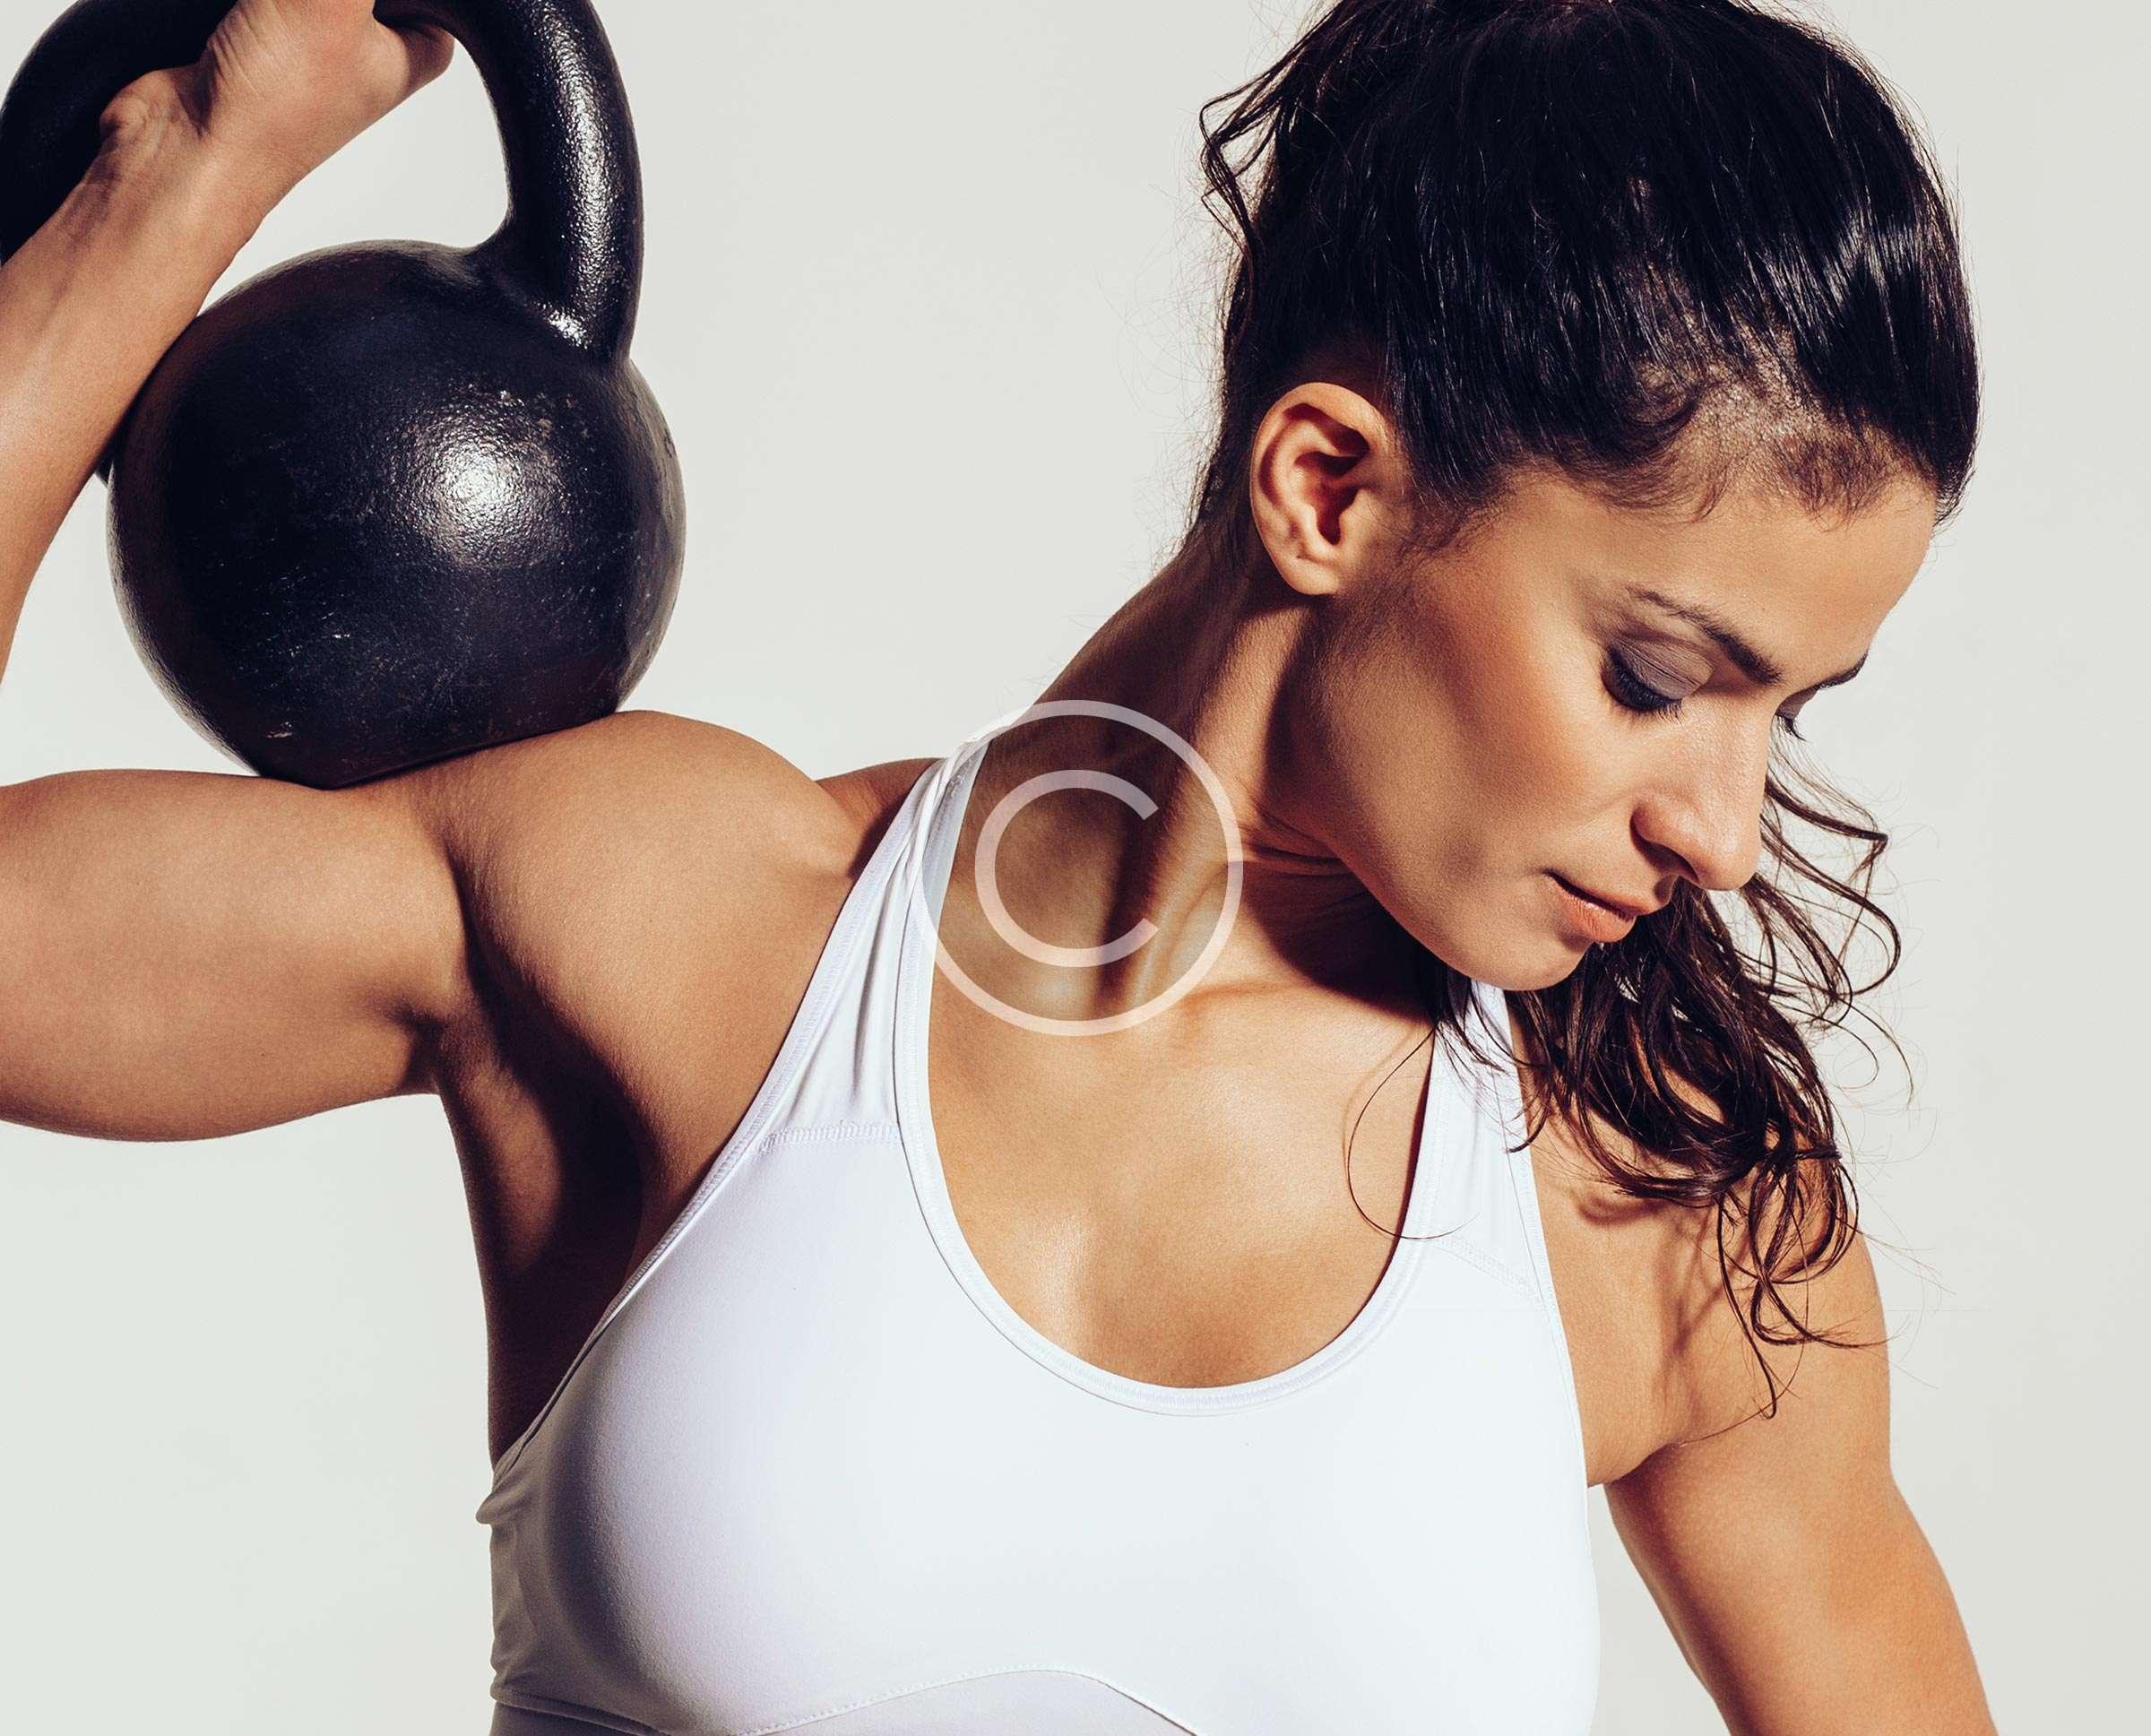 CrossFit Workouts: 5 Killer CrossFit WODs - CrossFit ...